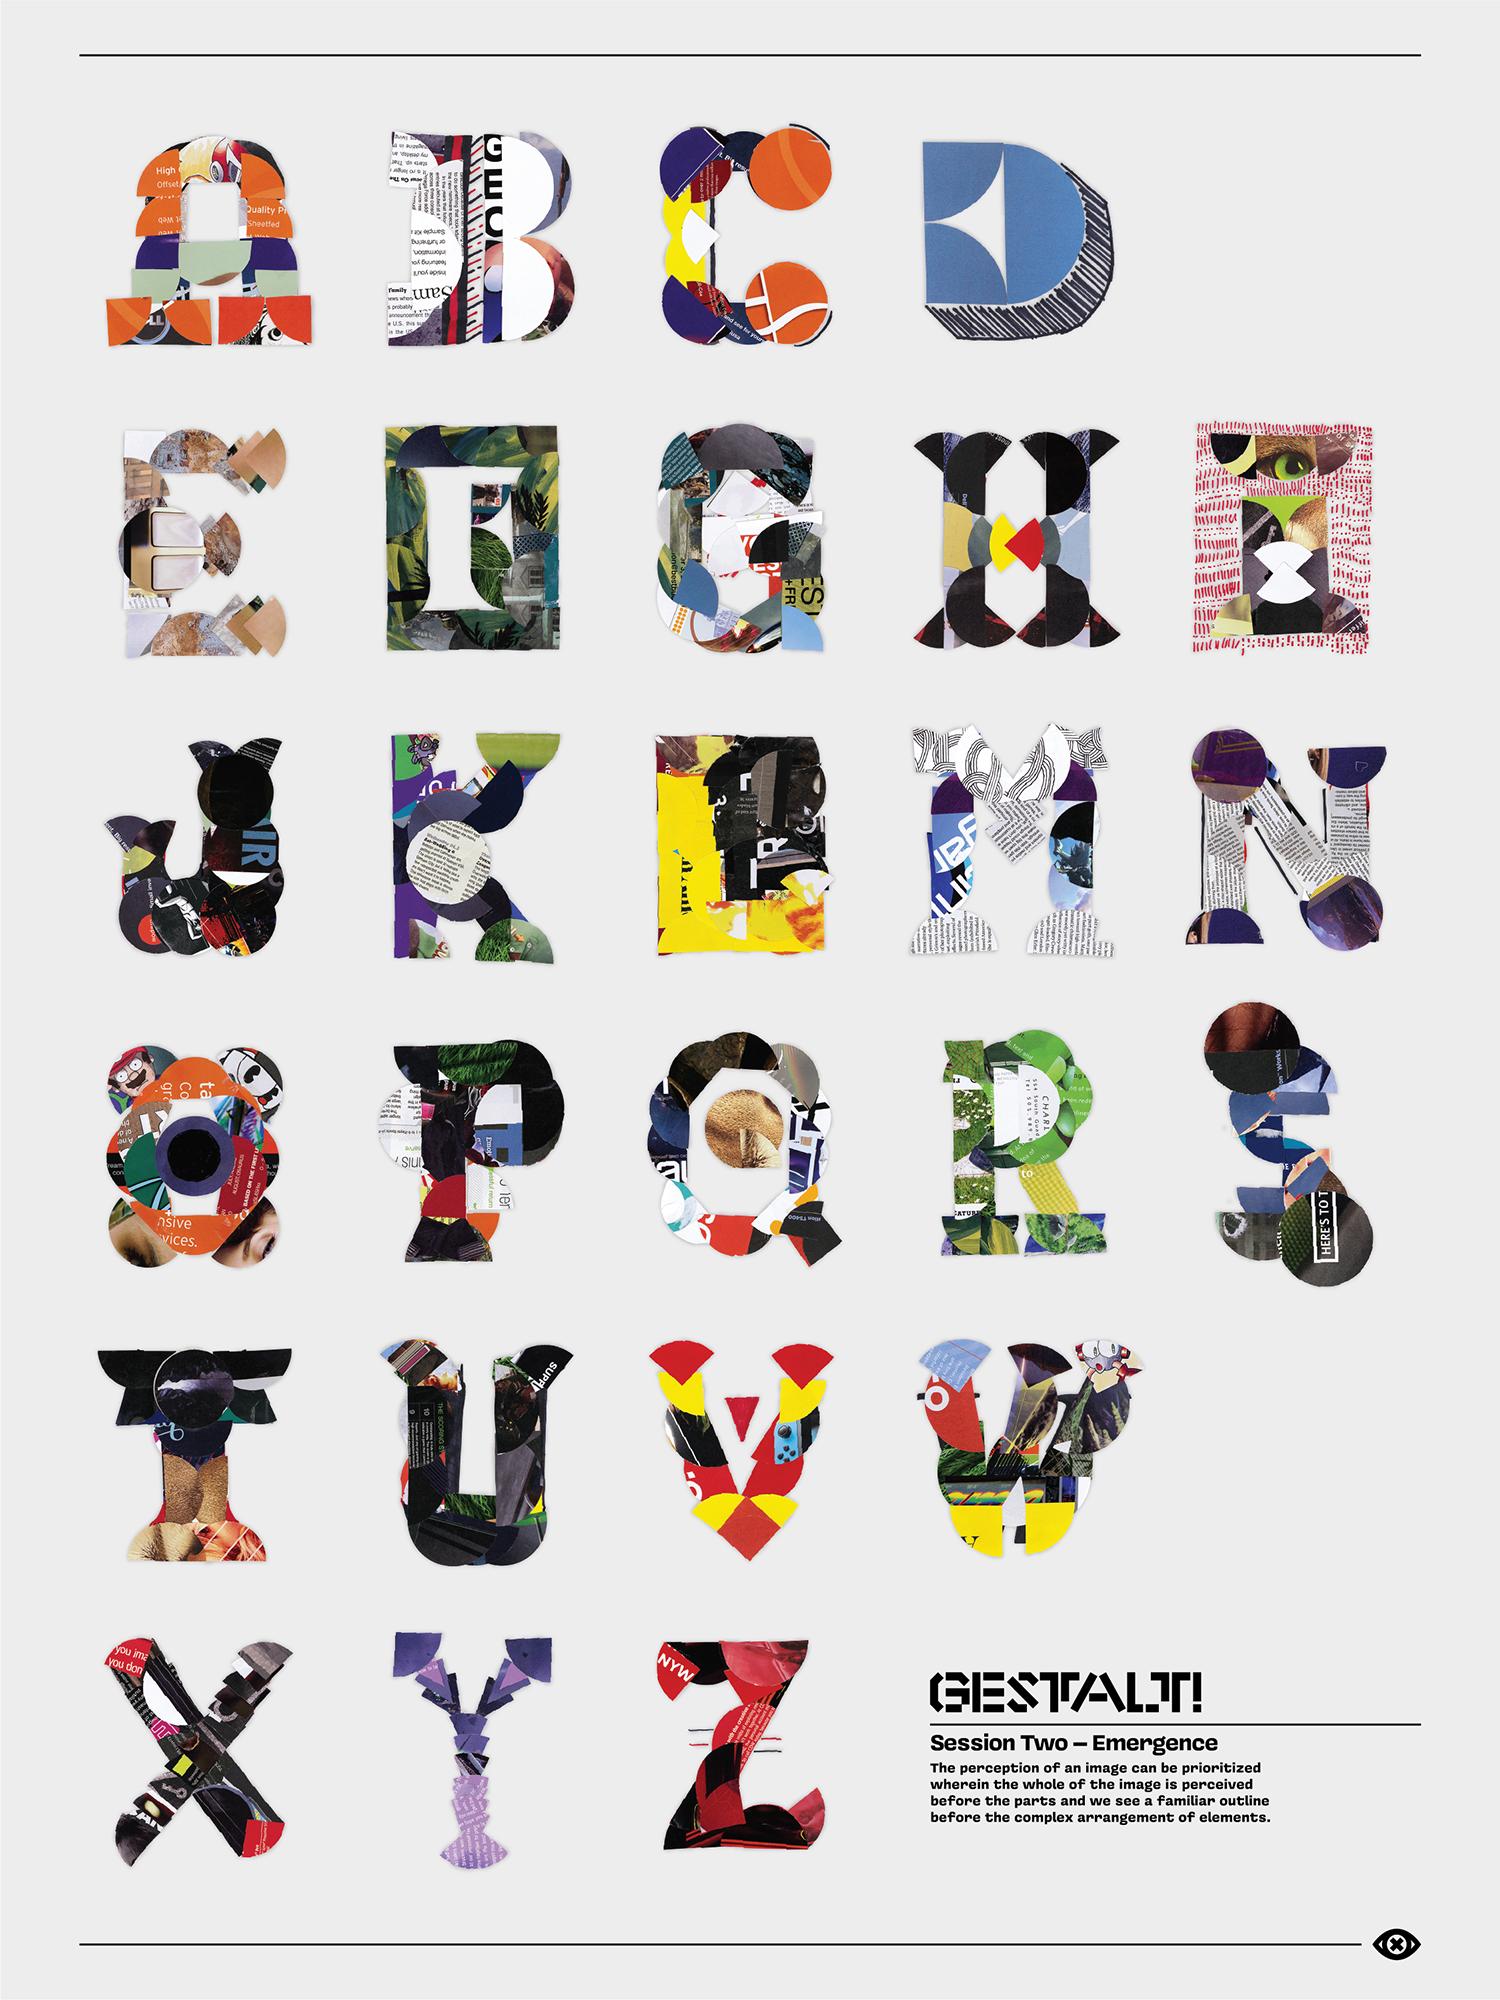 Gestalt_Emergence_FinalPoster-15.png